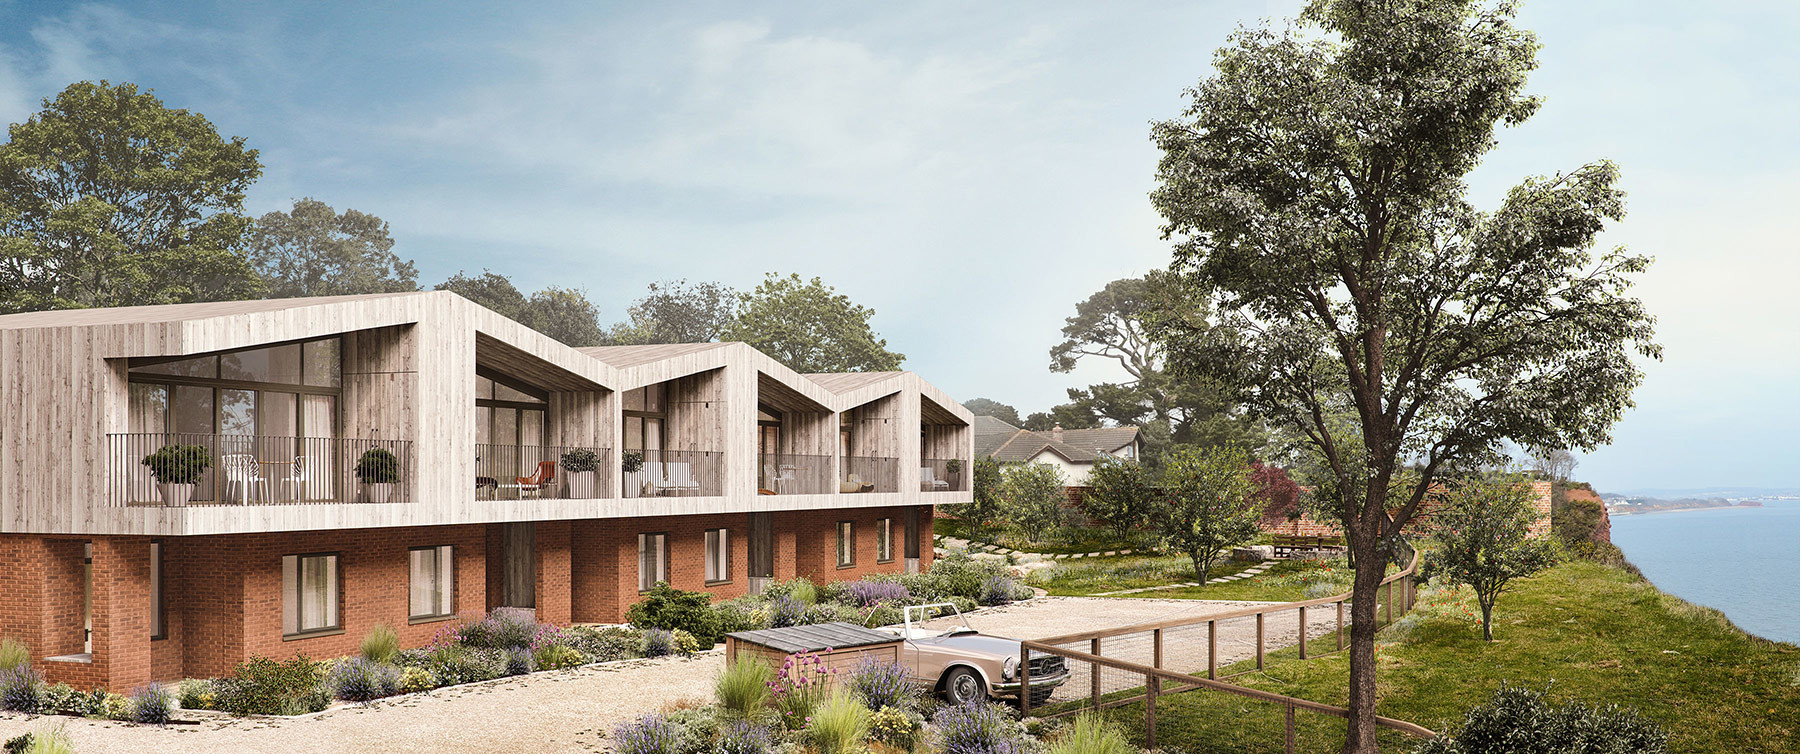 Sarah-Wigglesworth-Architects Shell-Cove-OC External 1800